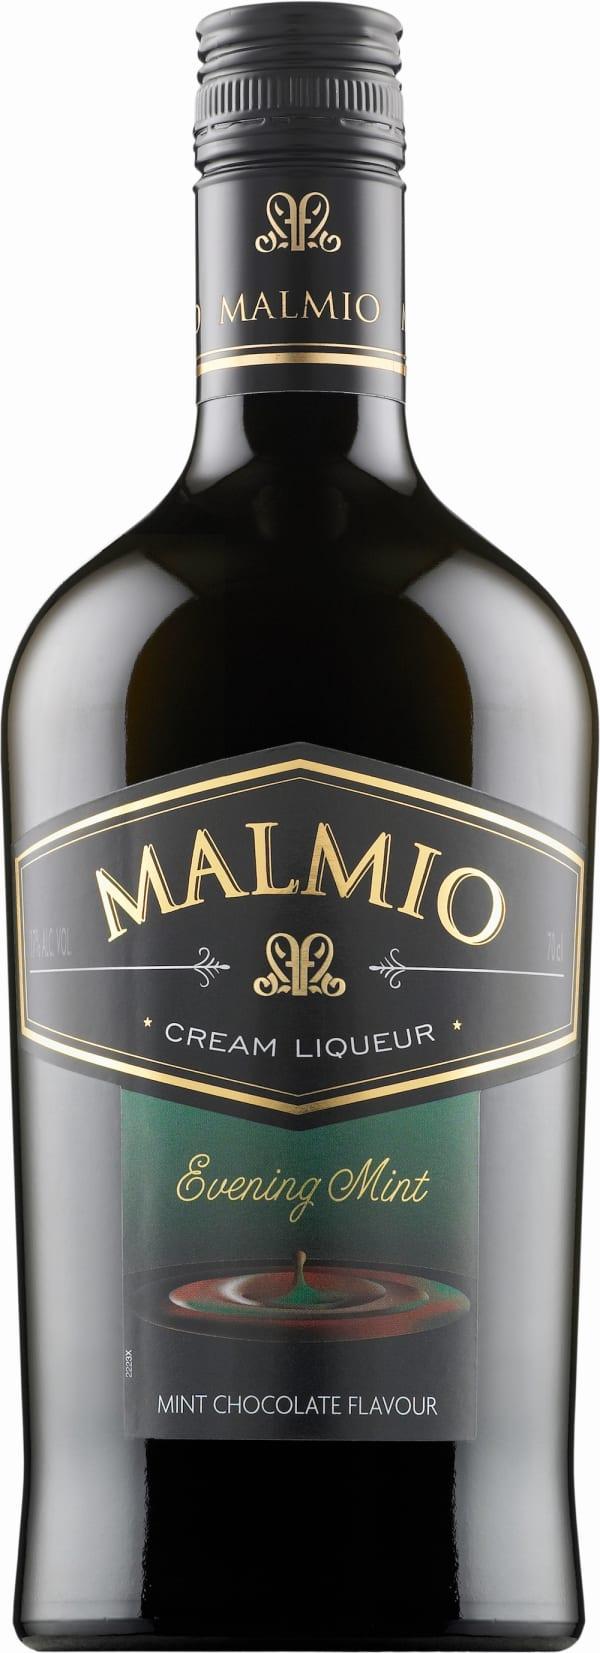 Malmio Evening Mint